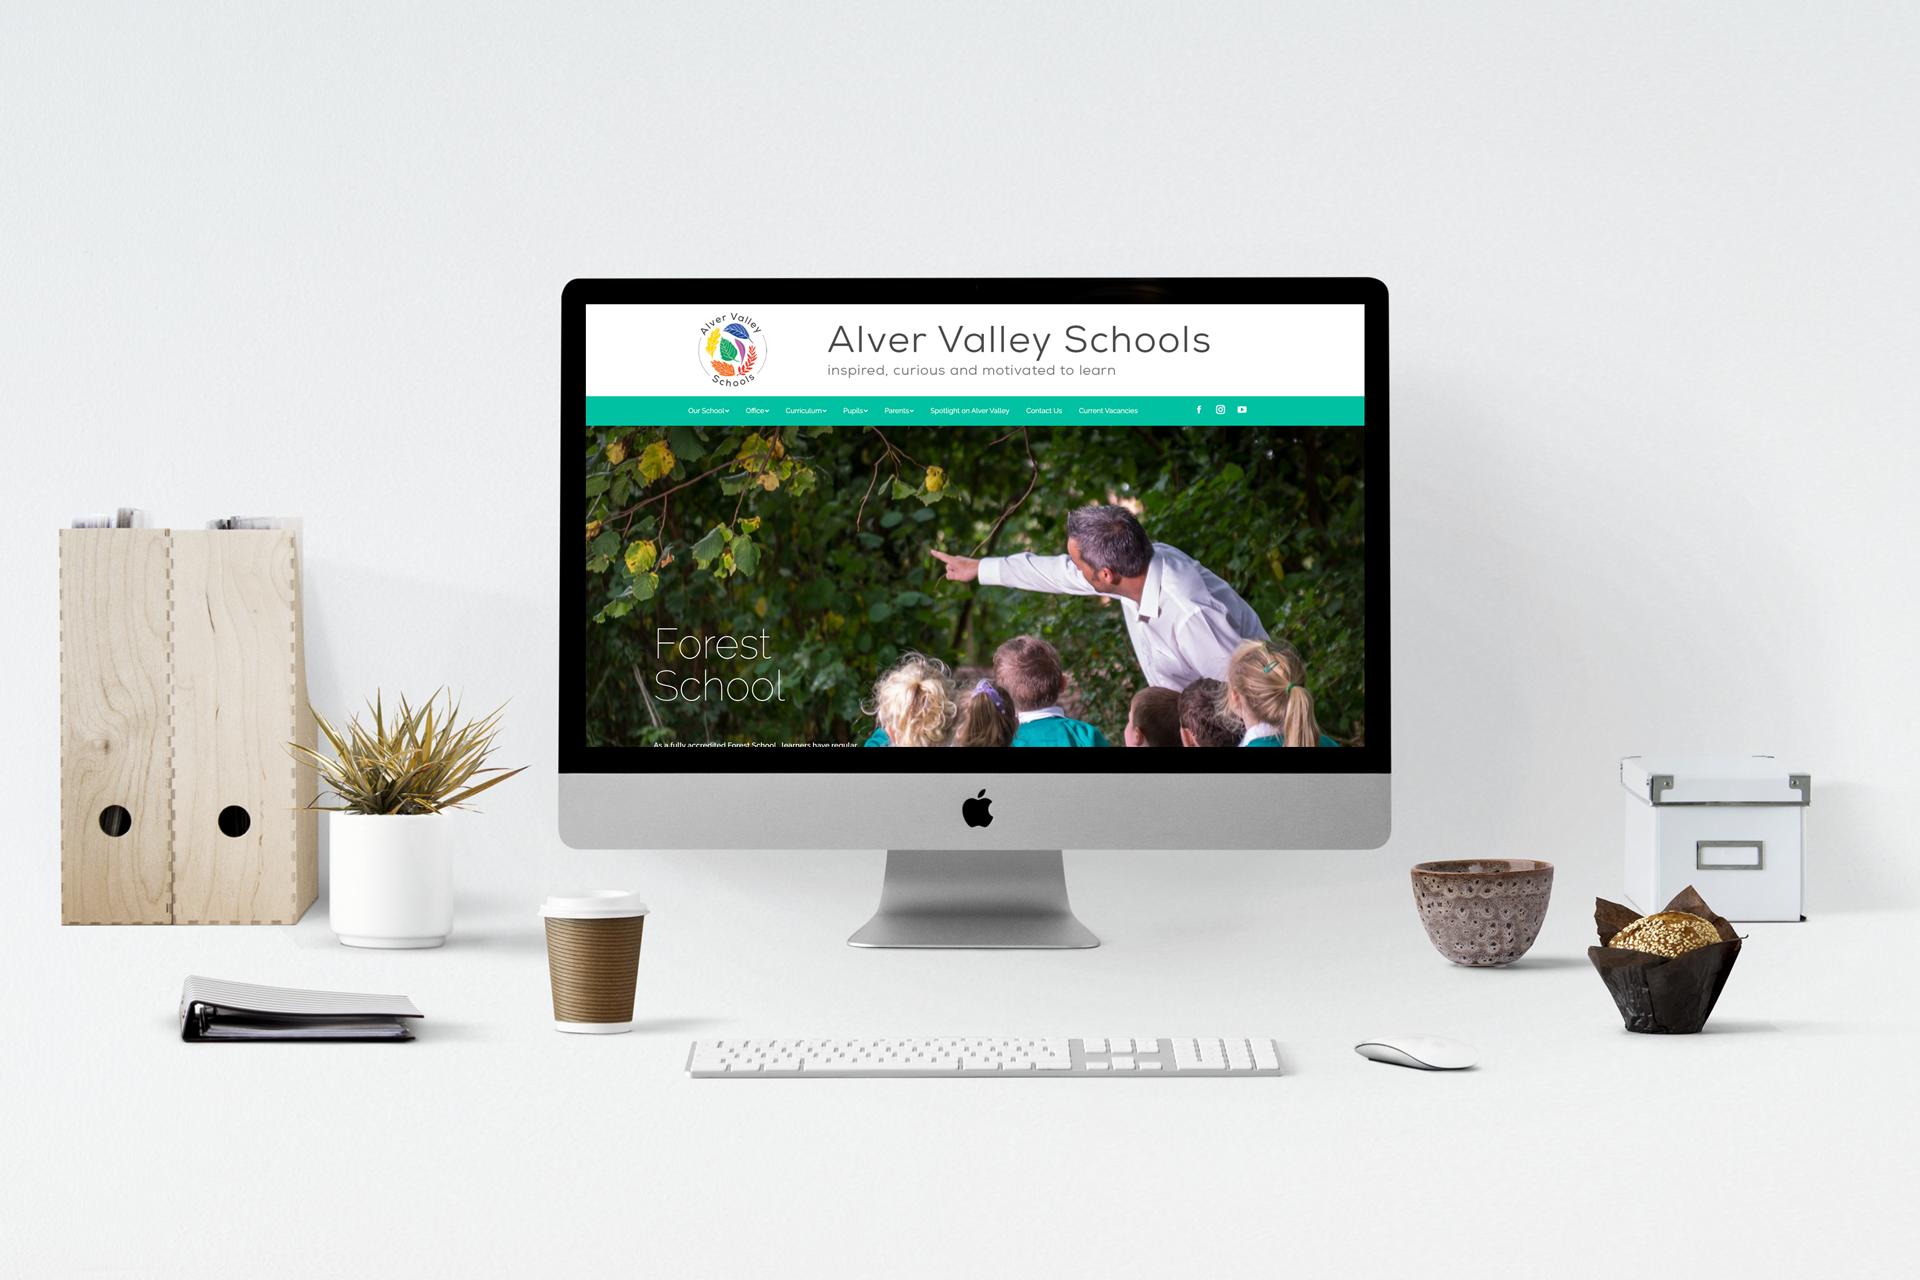 Website for Alver Valley Schools